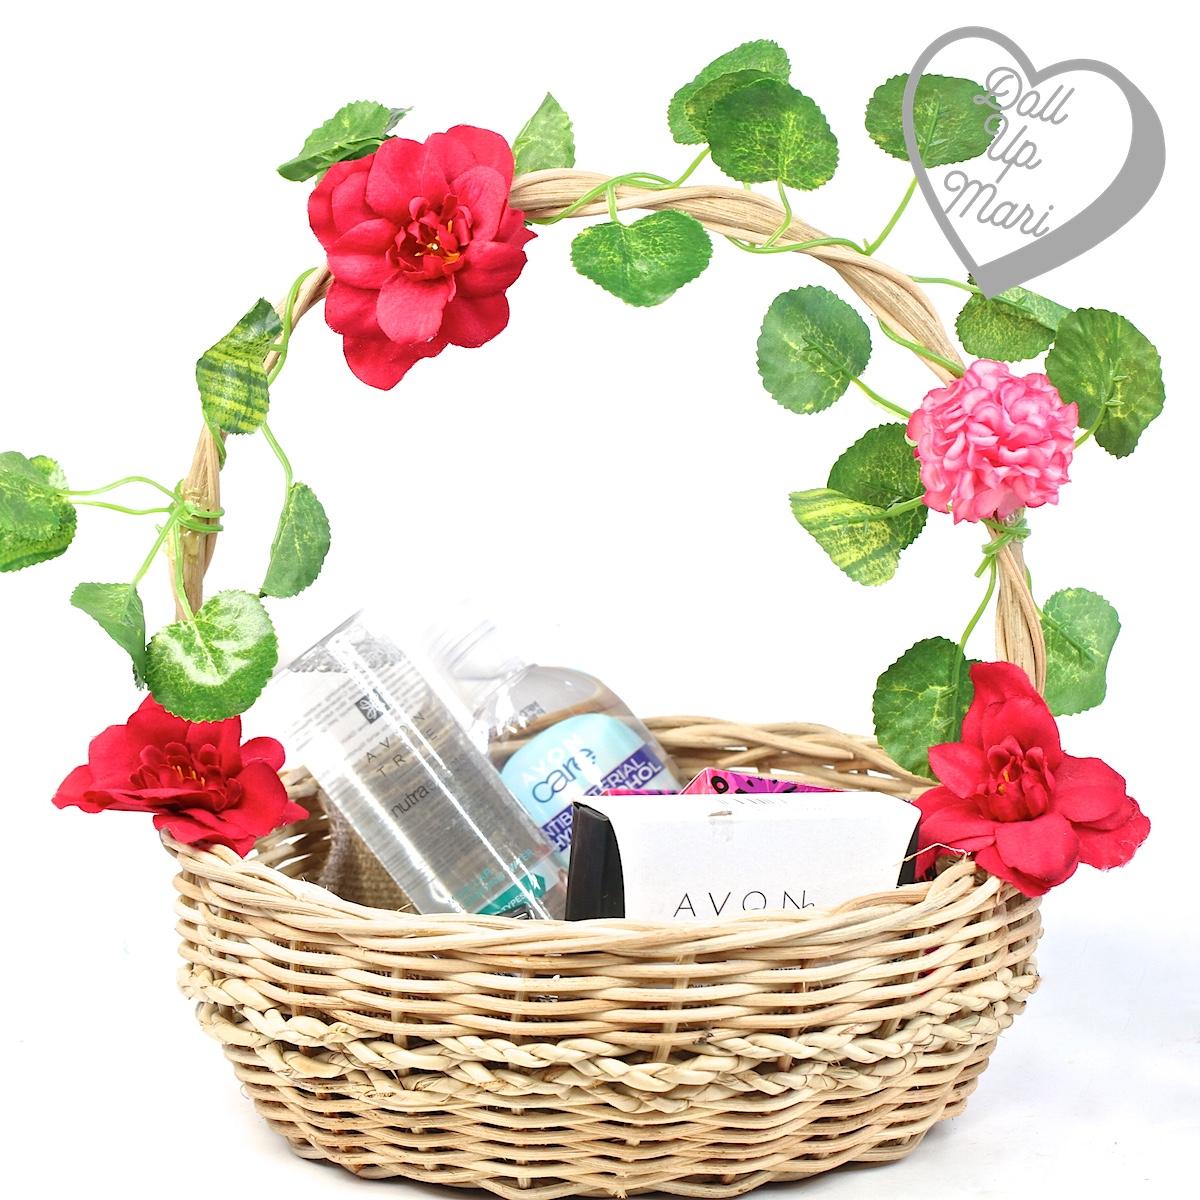 AVON Floral Wonderland Collection in a floral basket seeding kit